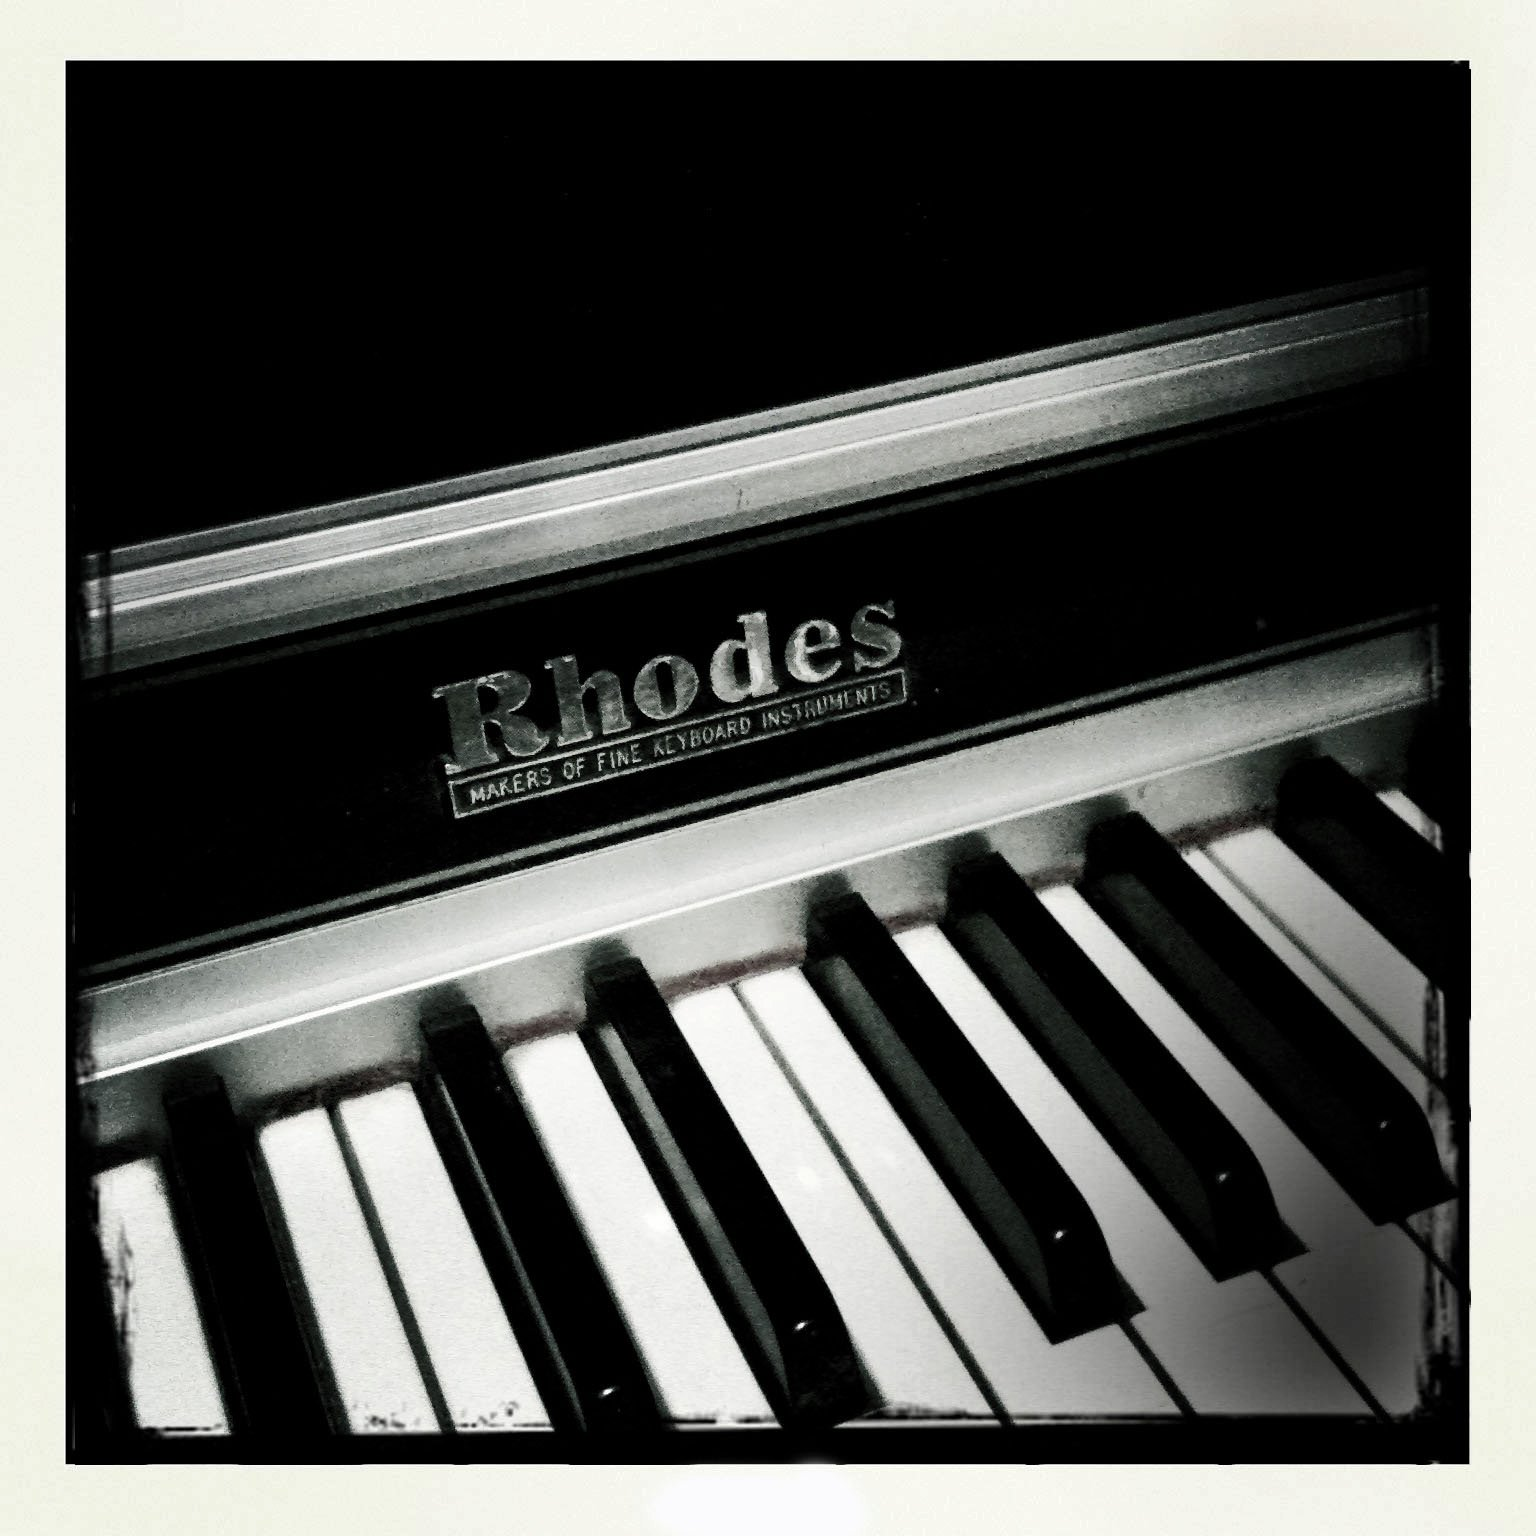 Peter's Rhodes